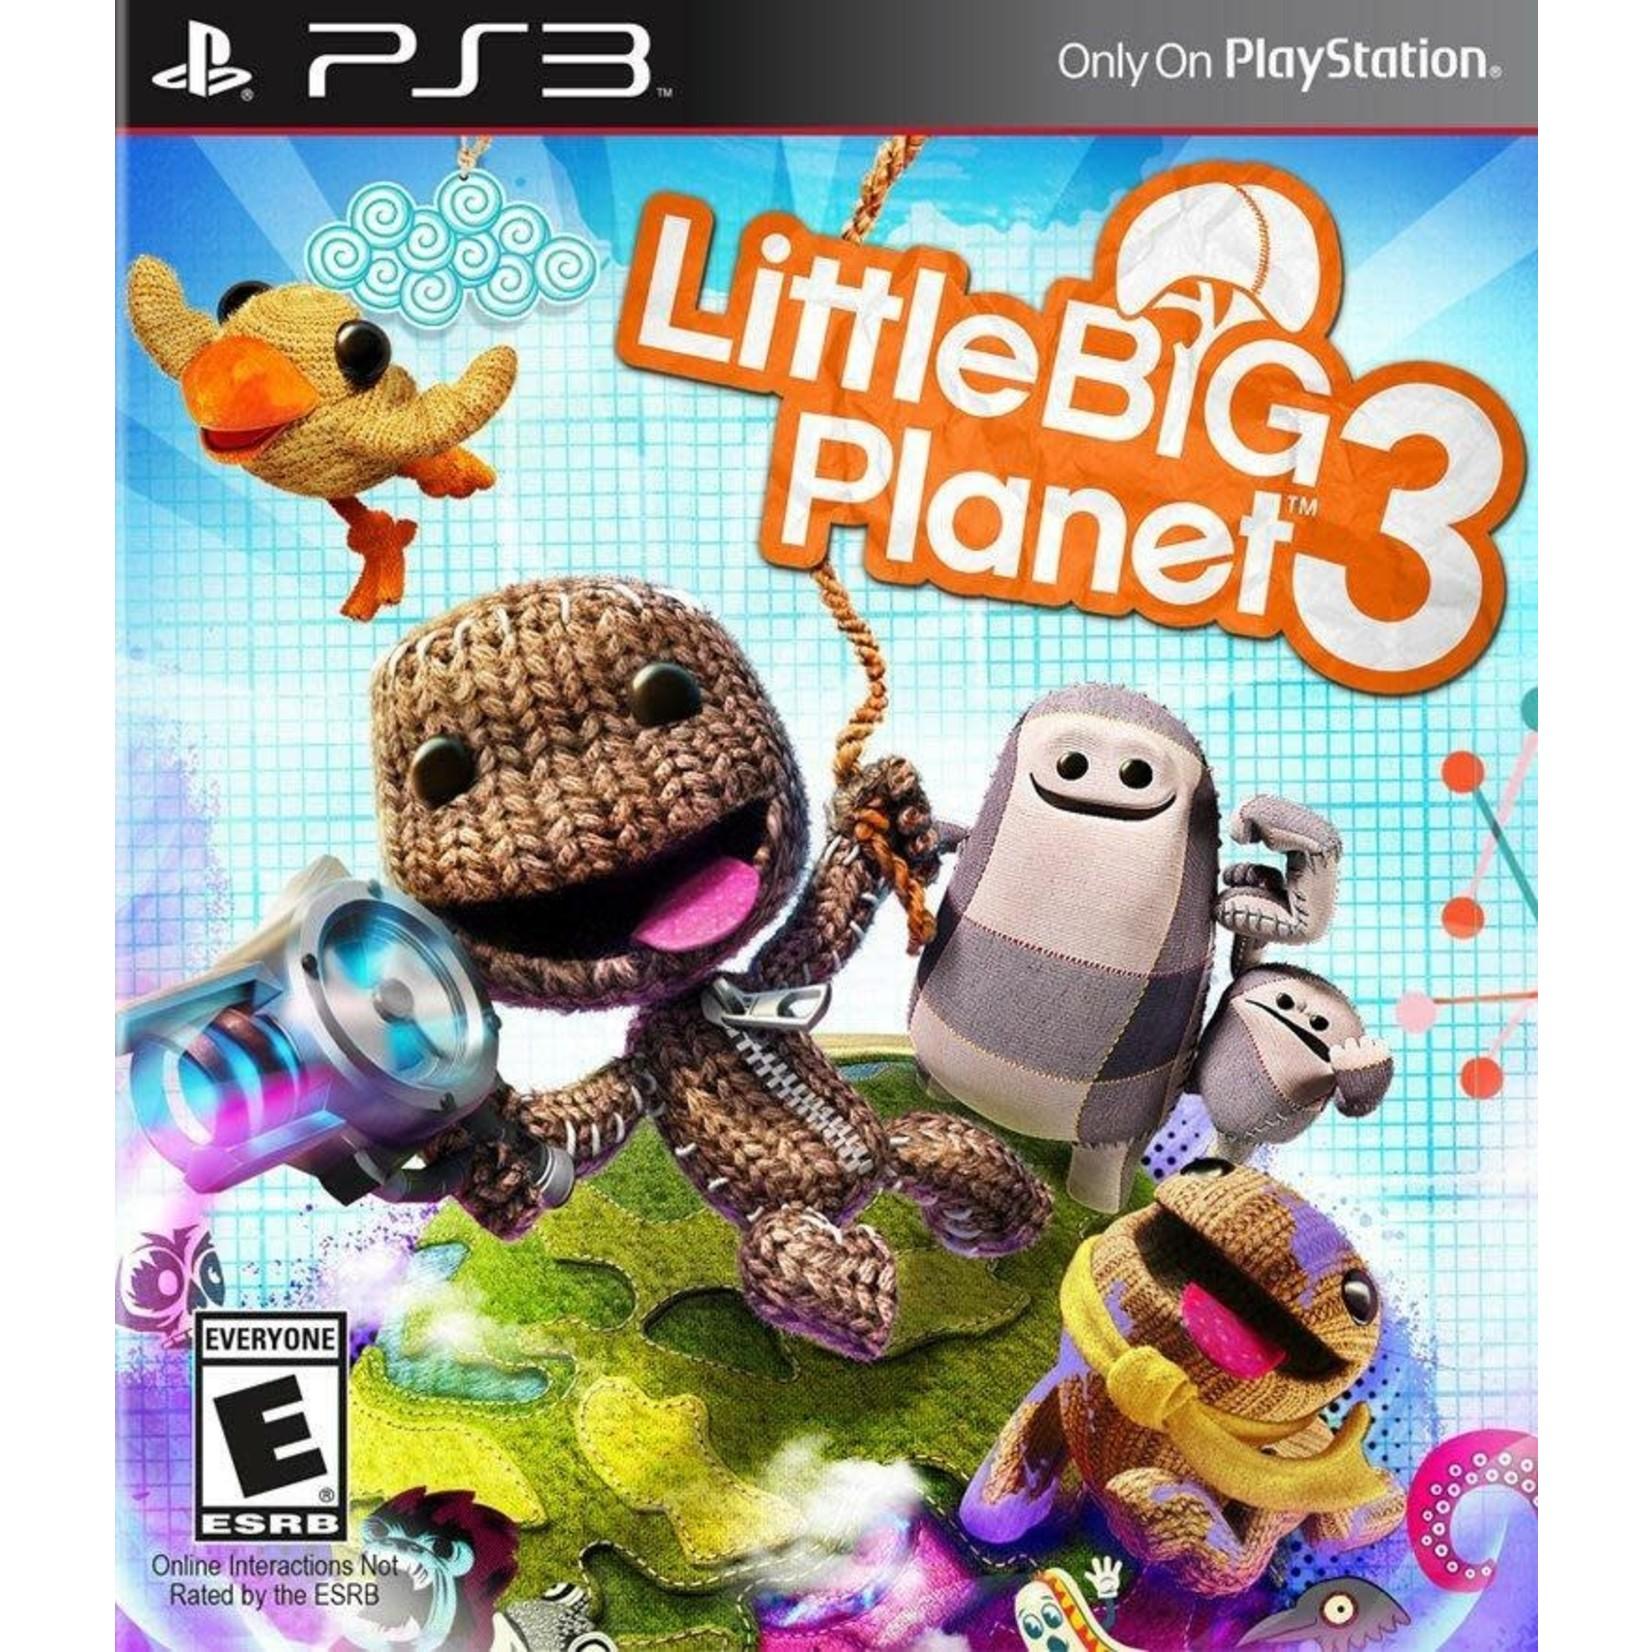 PS3U-LittleBigPlanet 3